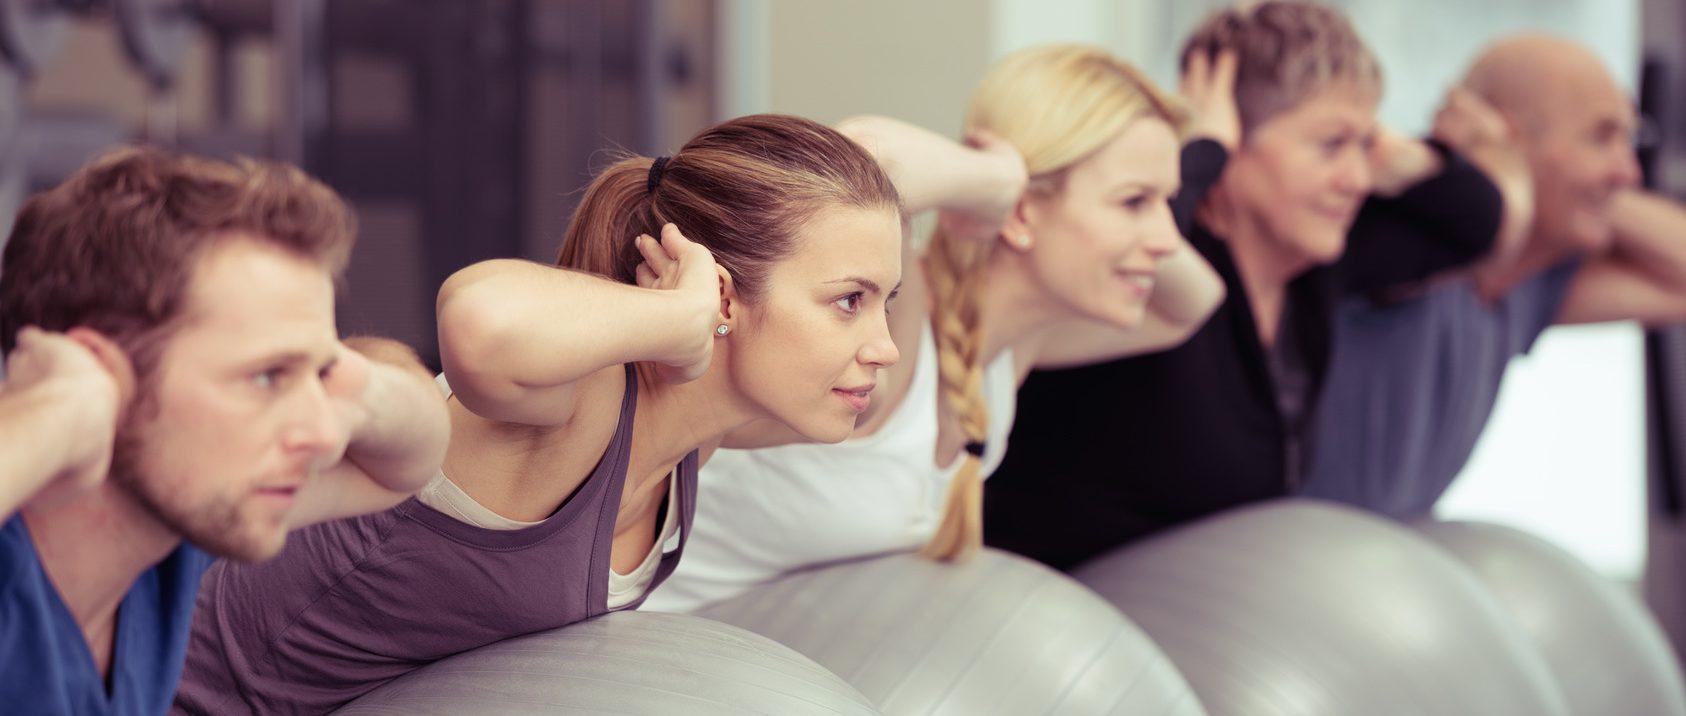 Fitnessstudio in Neuss Sauna Wellness Kurse Fitness